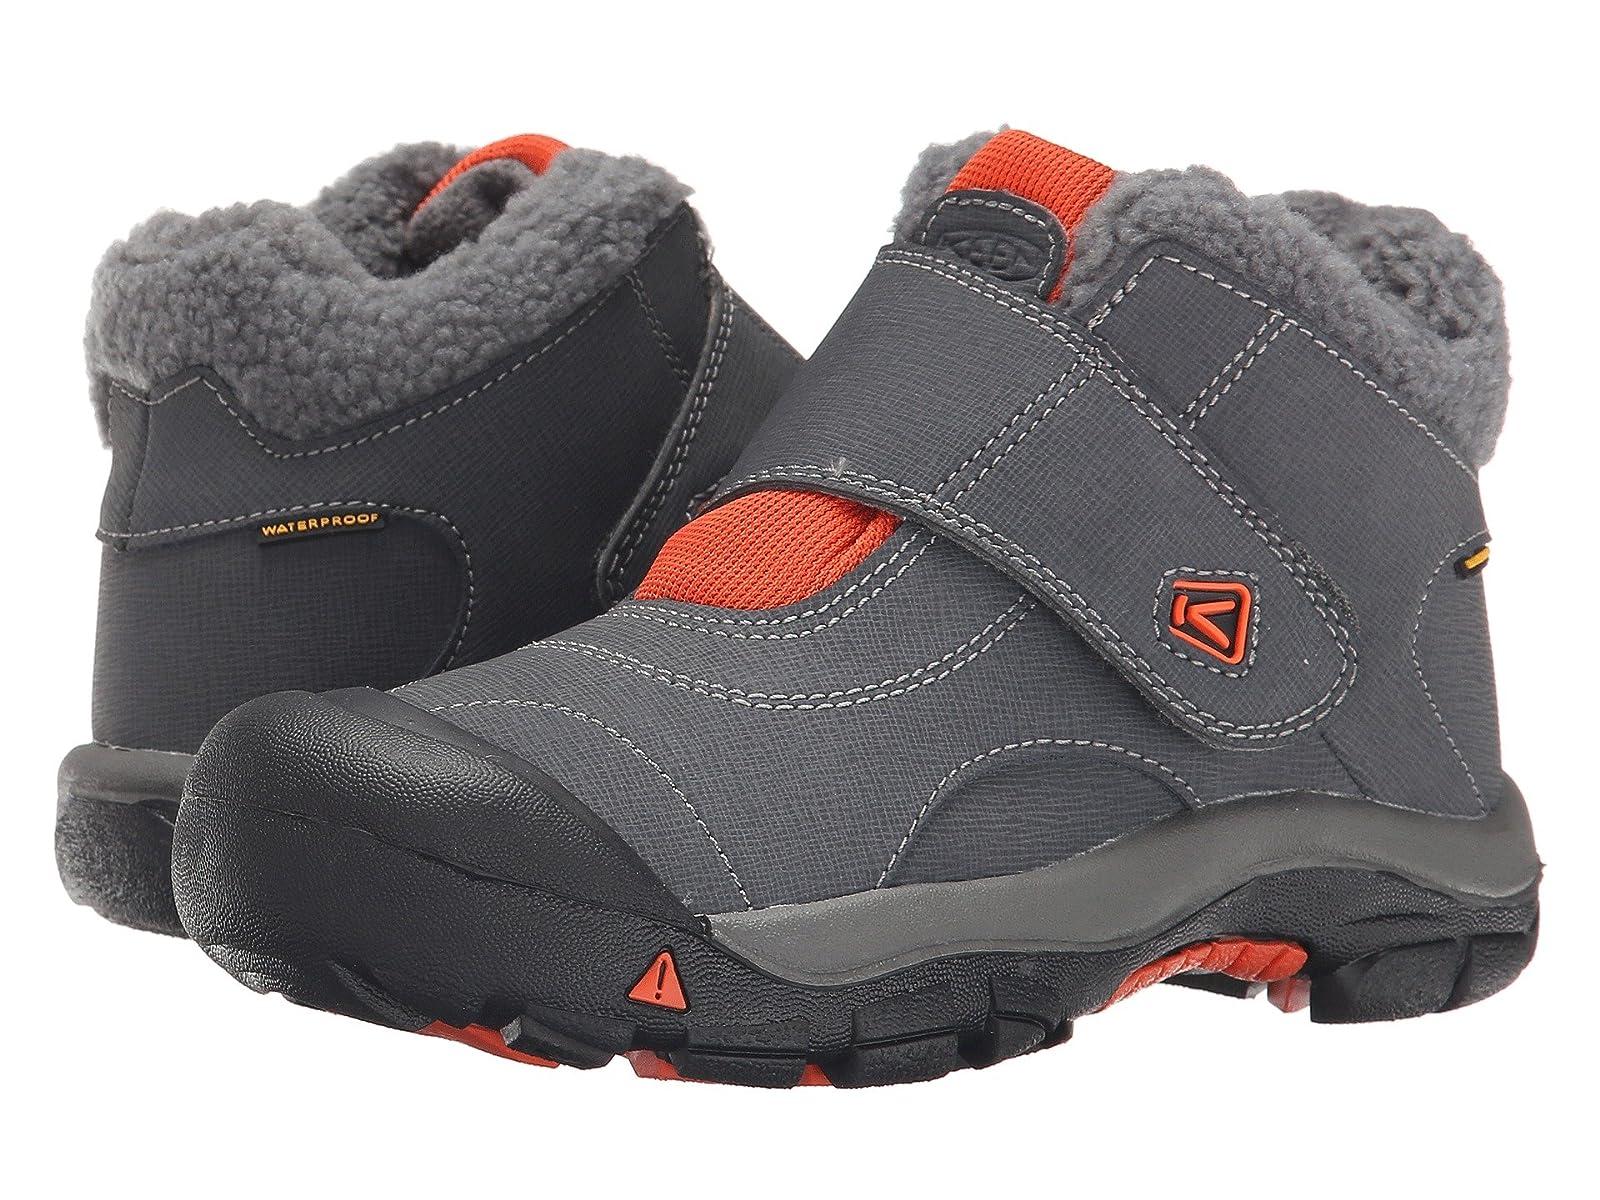 Keen Kids Kootenay WP (Little Kid/Big Kid)Affordable and distinctive shoes